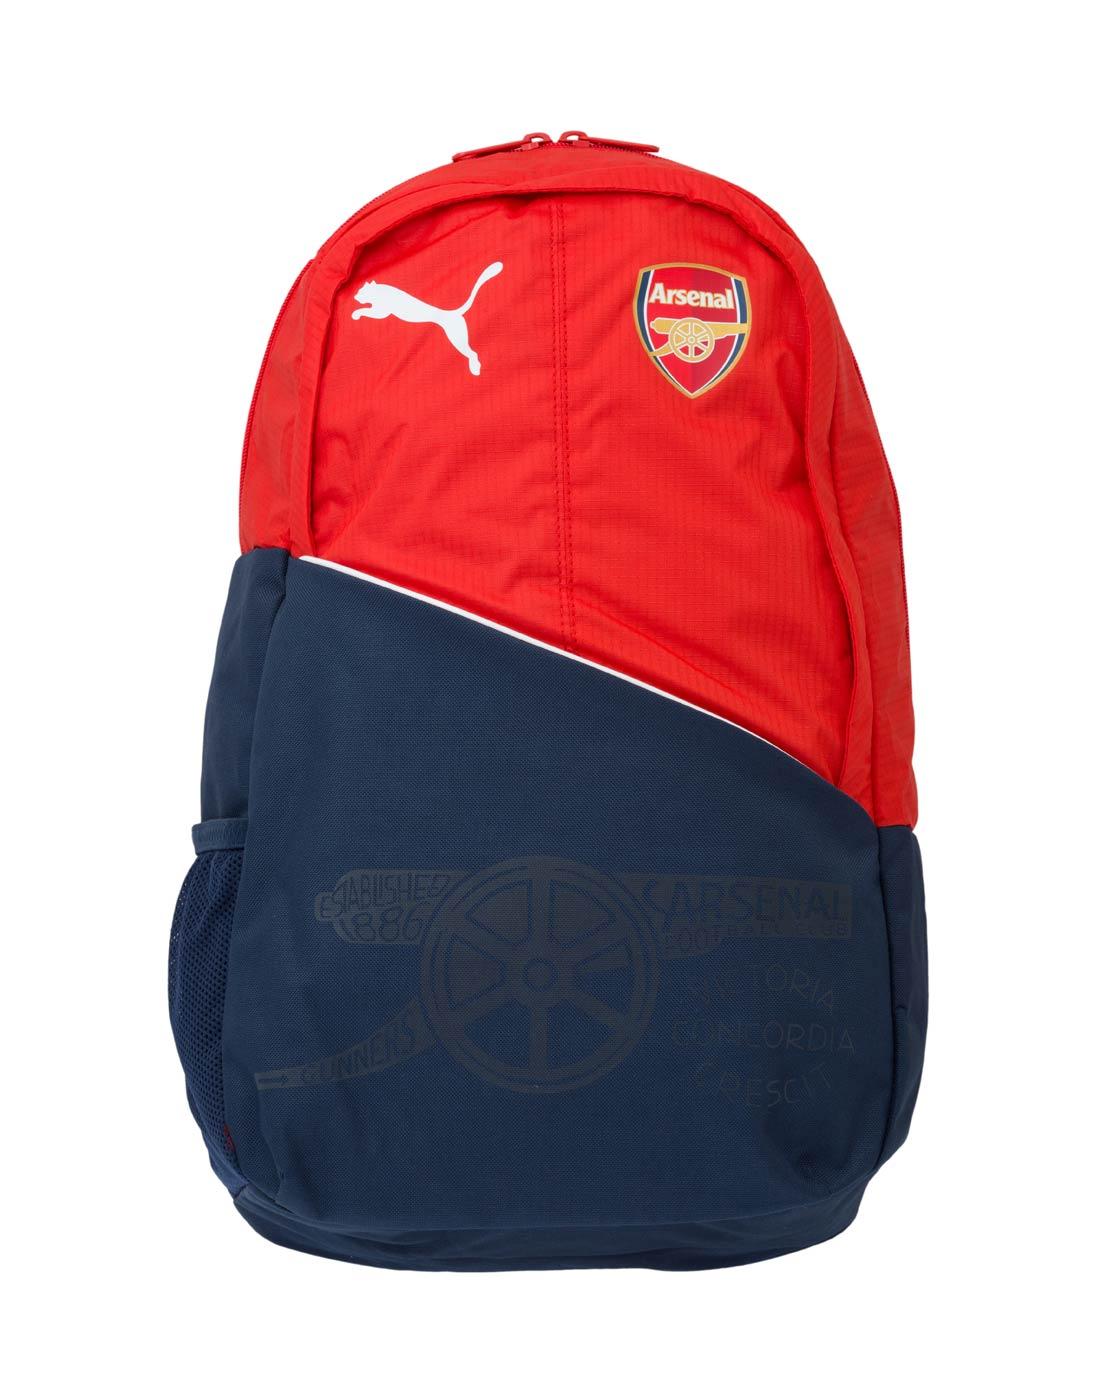 b83146ff6d8b Puma Arsenal Backpack